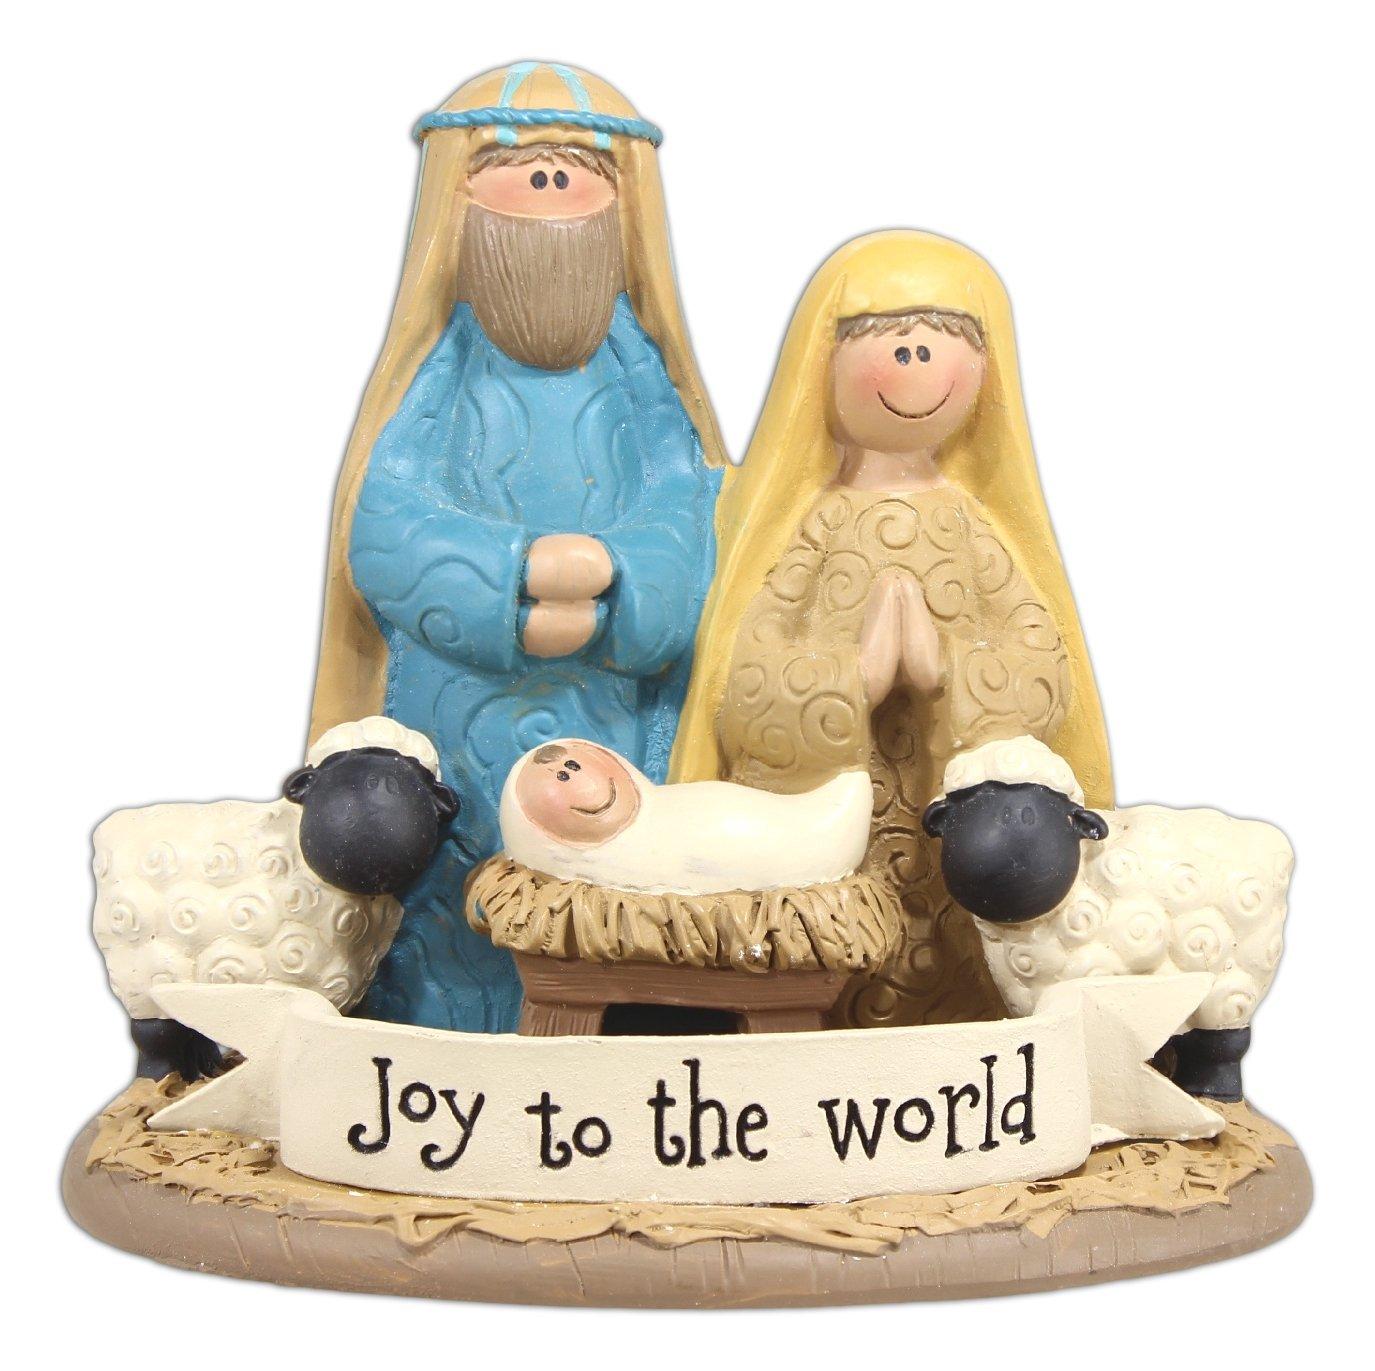 Blossom Bucket Joy to The World Nativity Christmas Decor, 3-1/2'' High